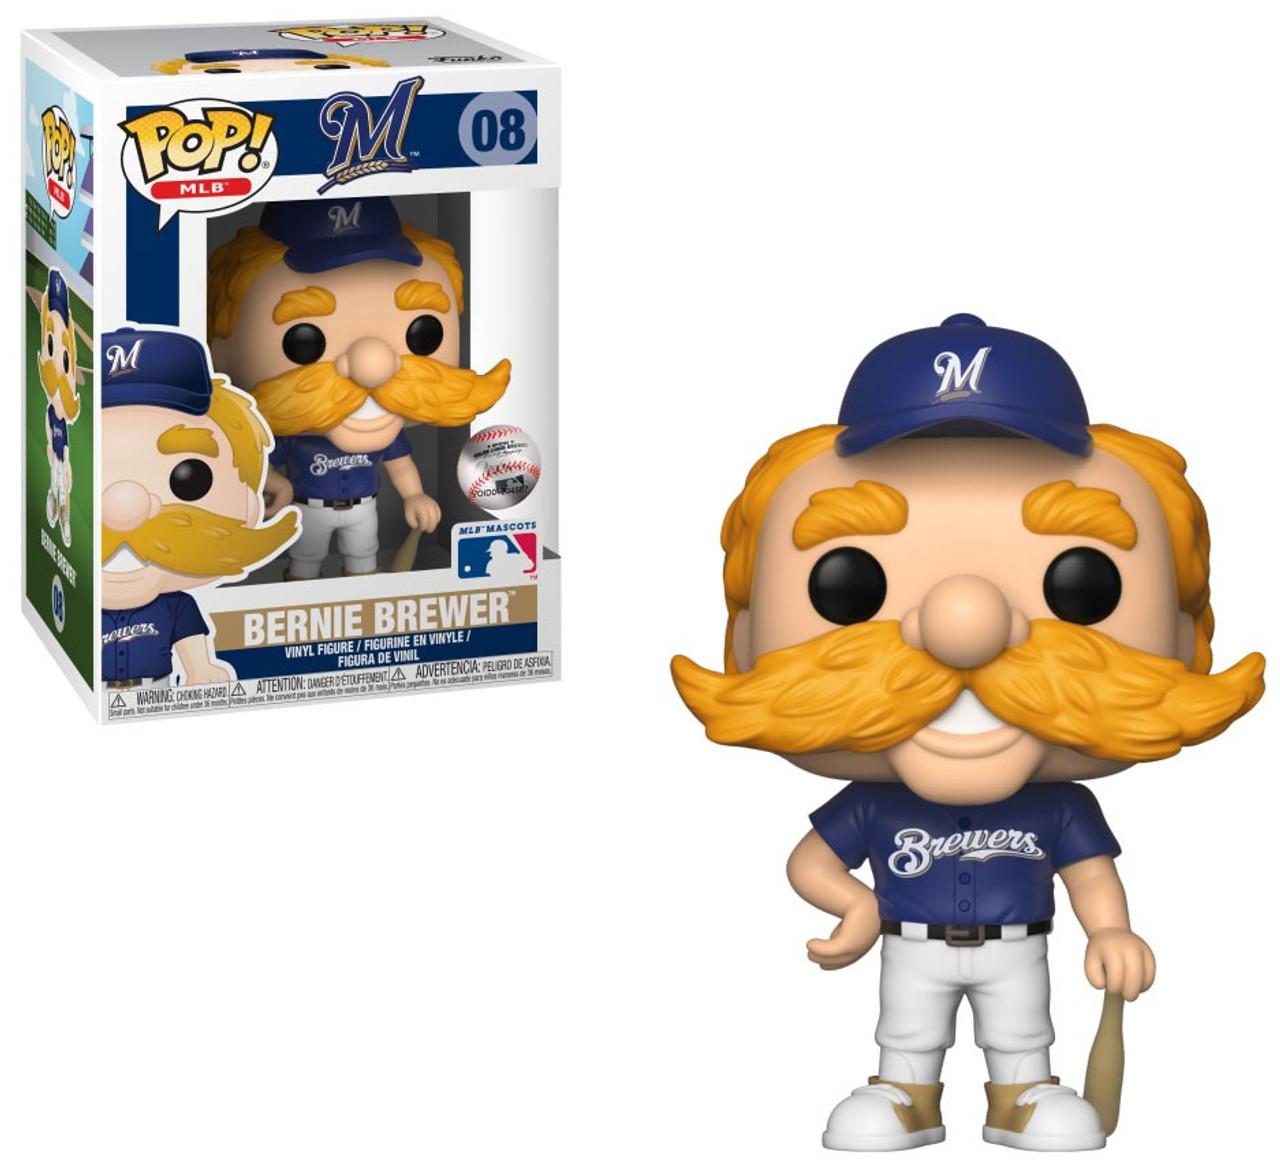 1e742d0a51f Funko Major League Baseball Milwaukee Brewers Funko POP MLB Bernie the  Brewer Vinyl Figure Mascot - ToyWiz